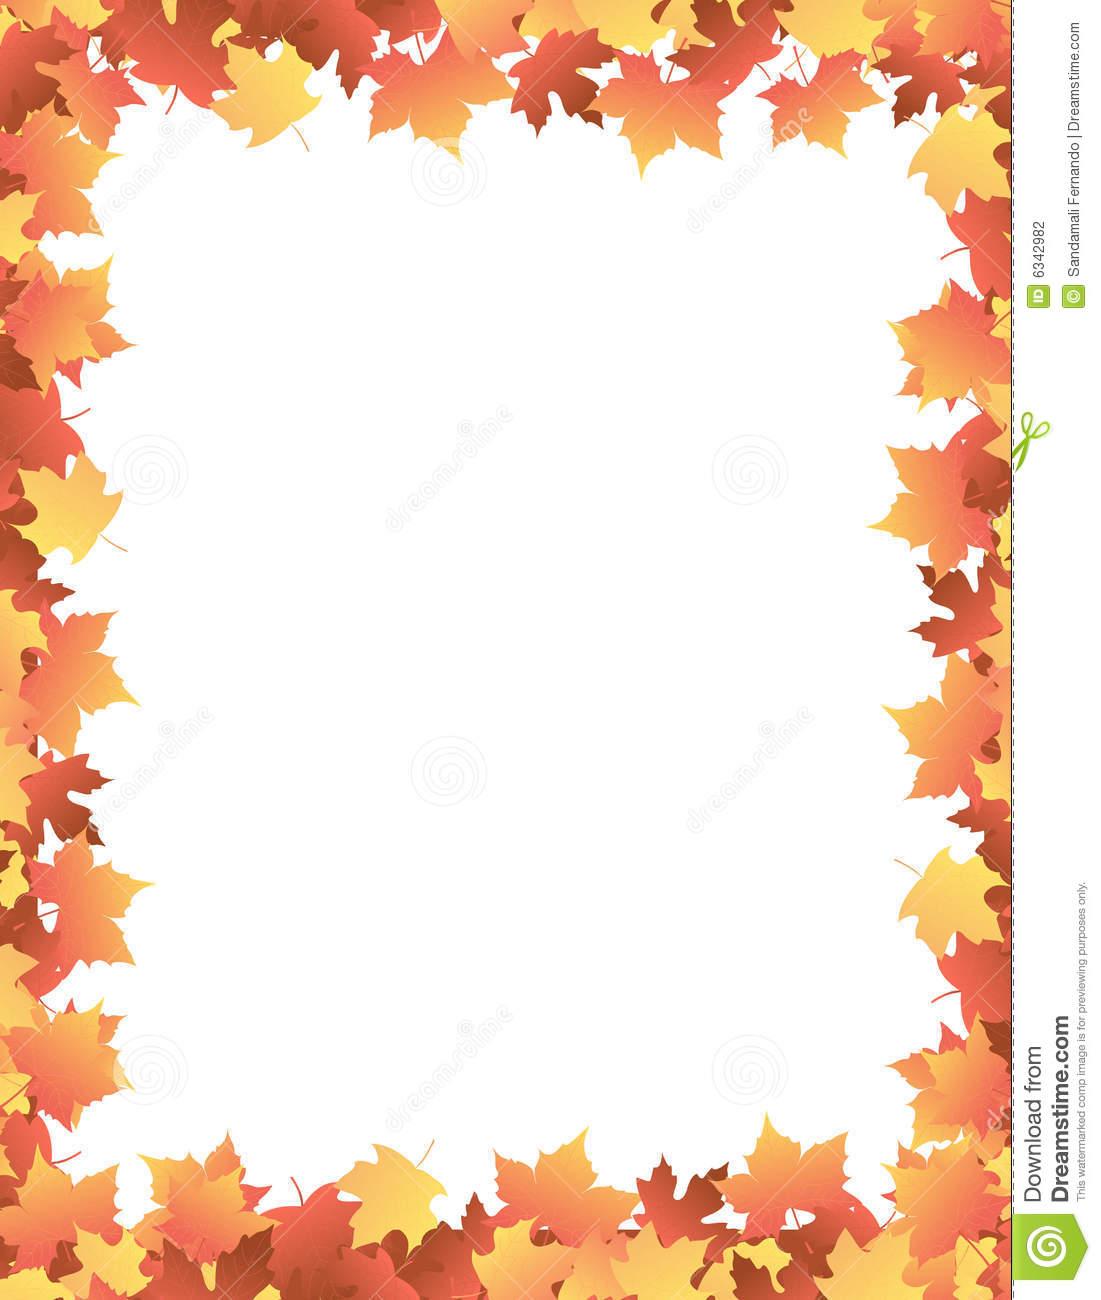 Fall Leaves Clip Art Border Recipe 101-Fall Leaves Clip Art Border Recipe 101-3